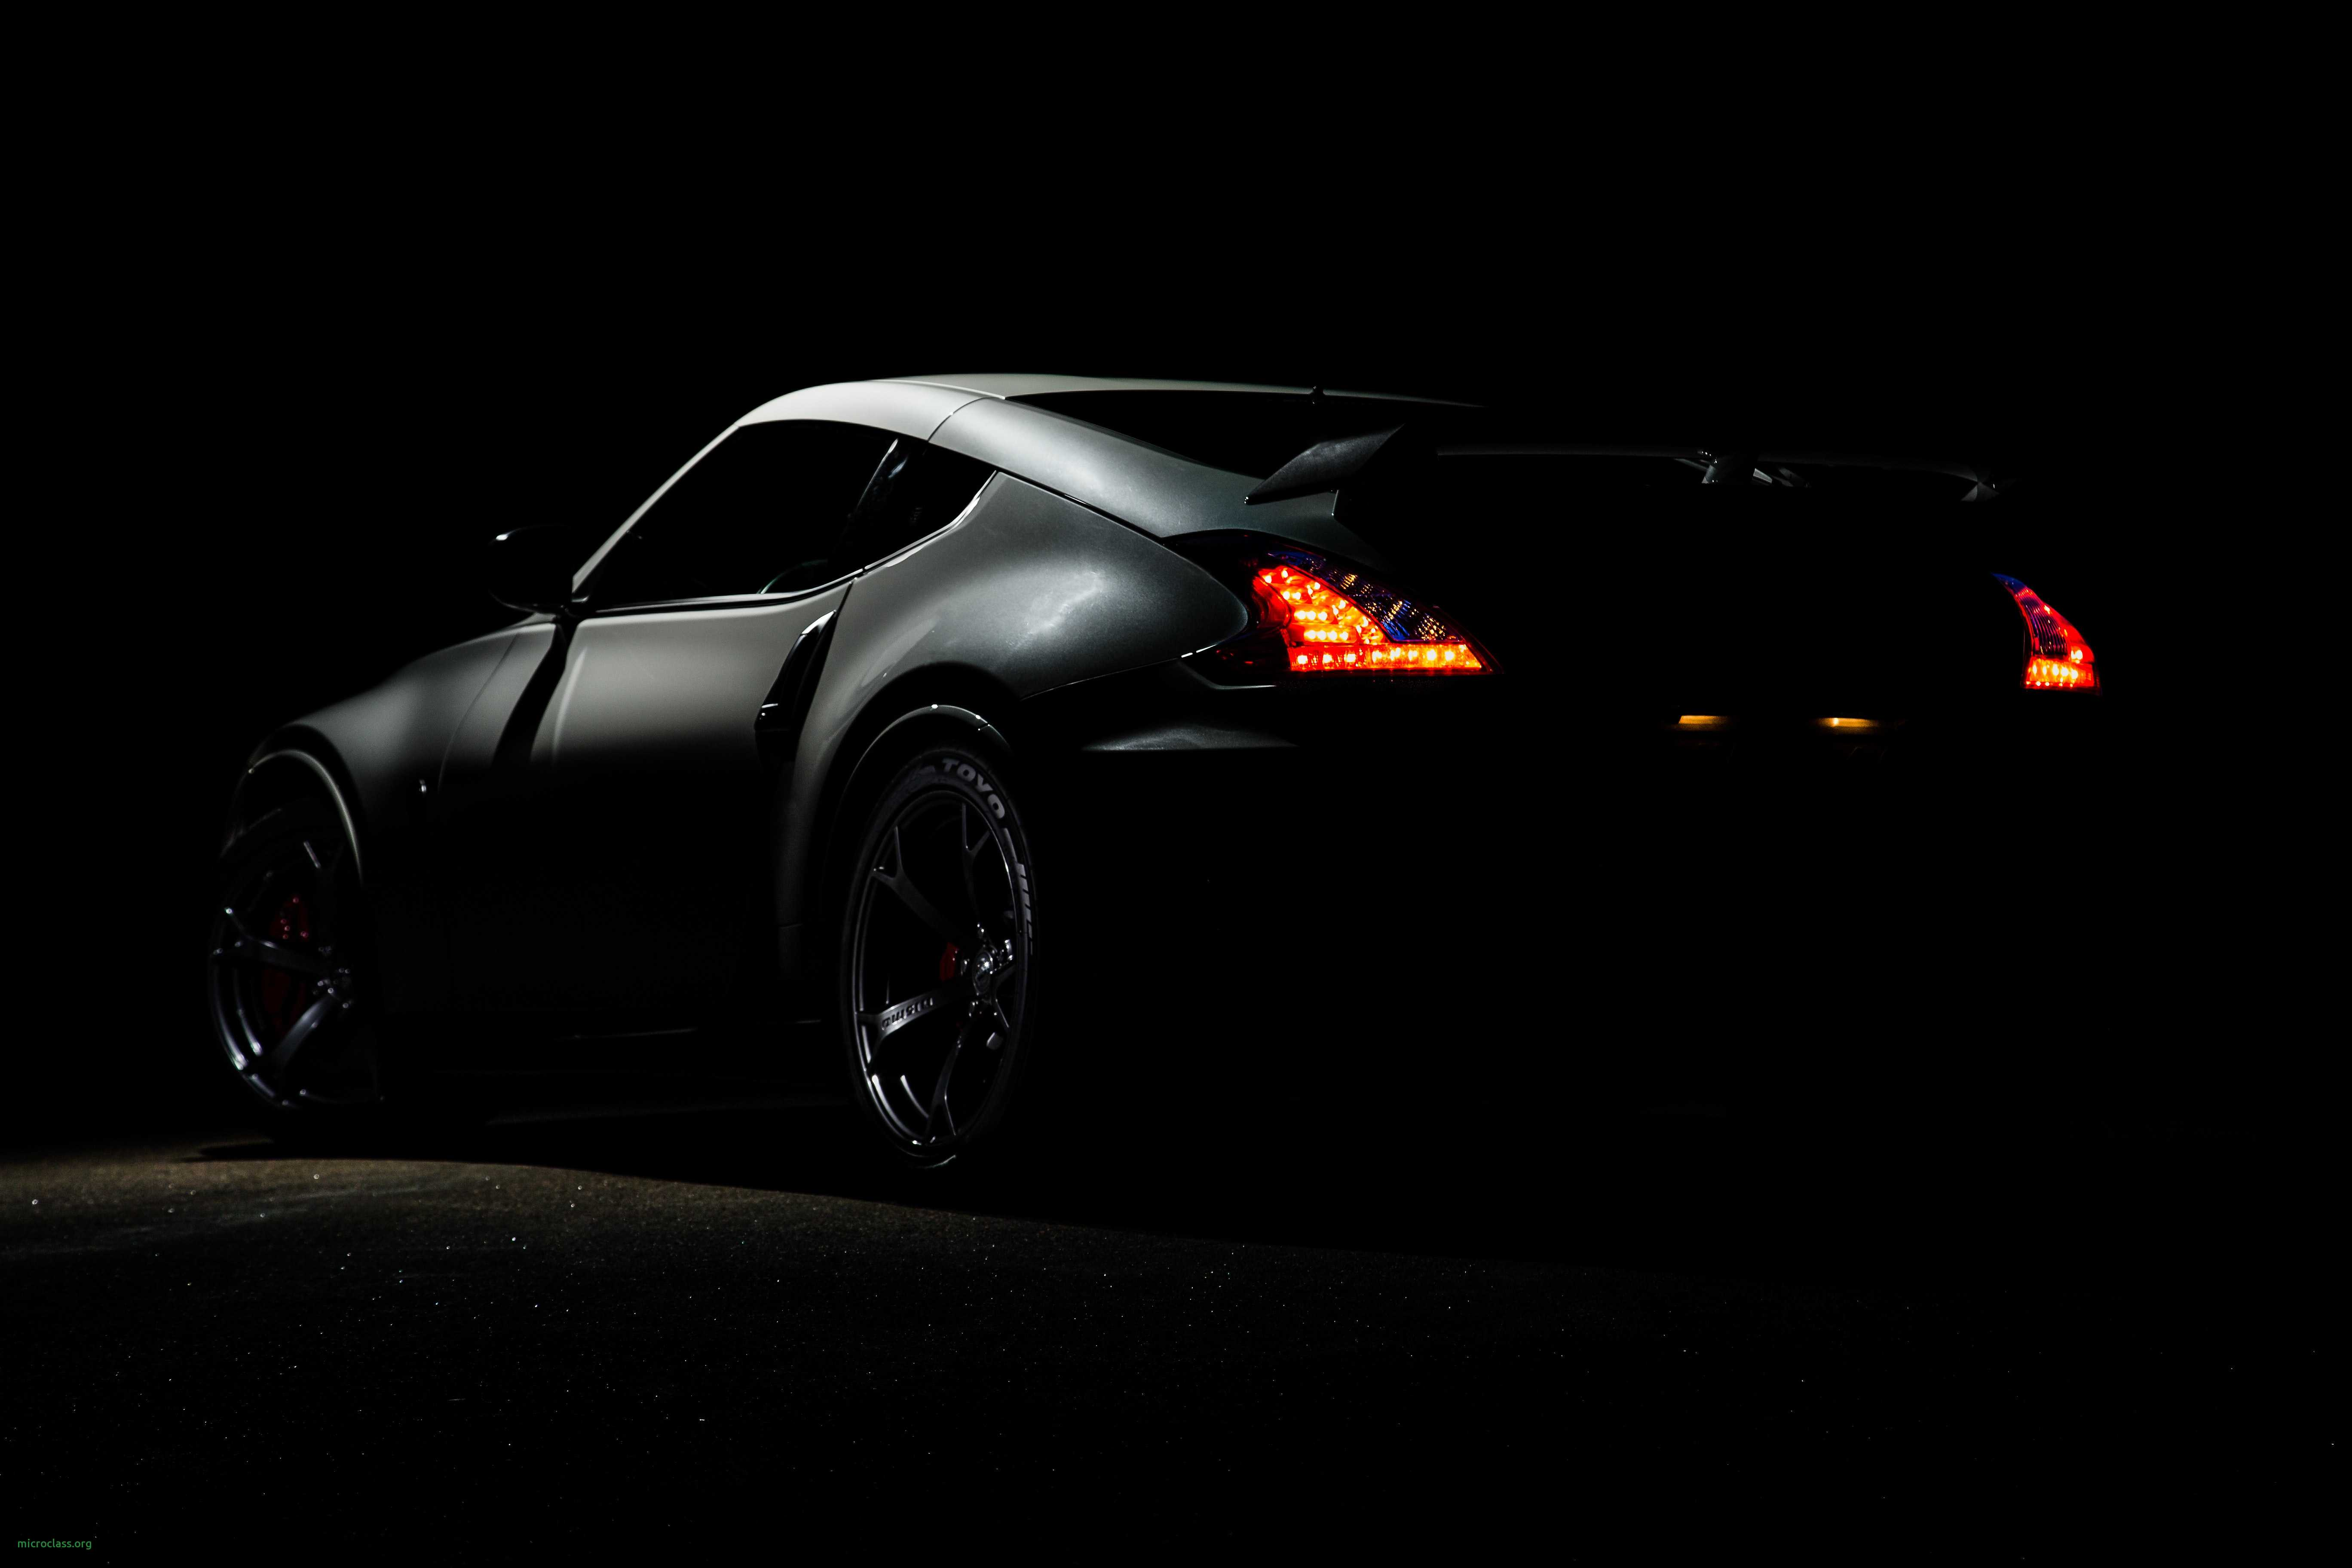 Dark Car Wallpaper Posted By Ethan Peltier